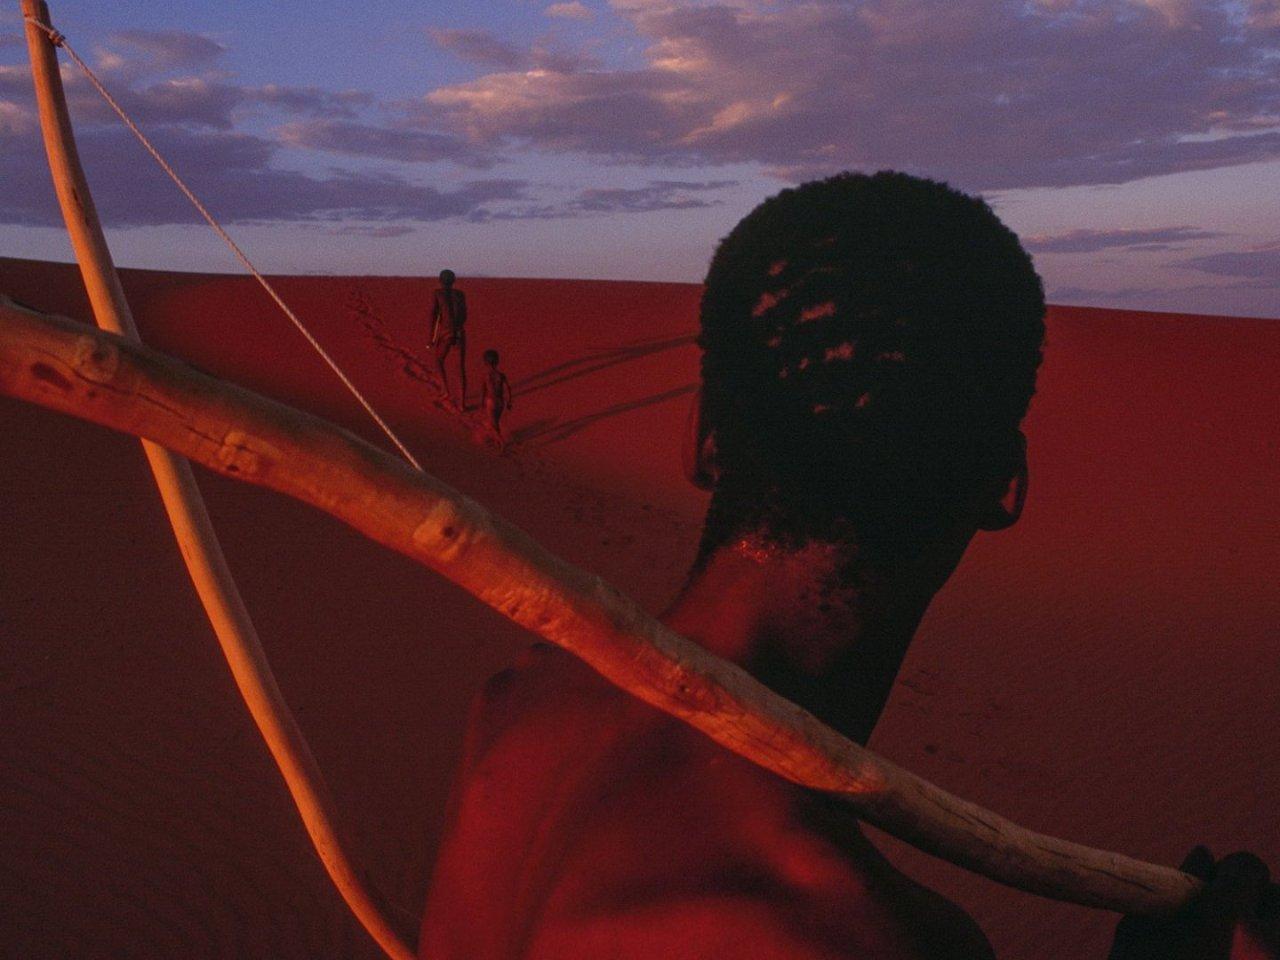 National-Geographic-desert-11